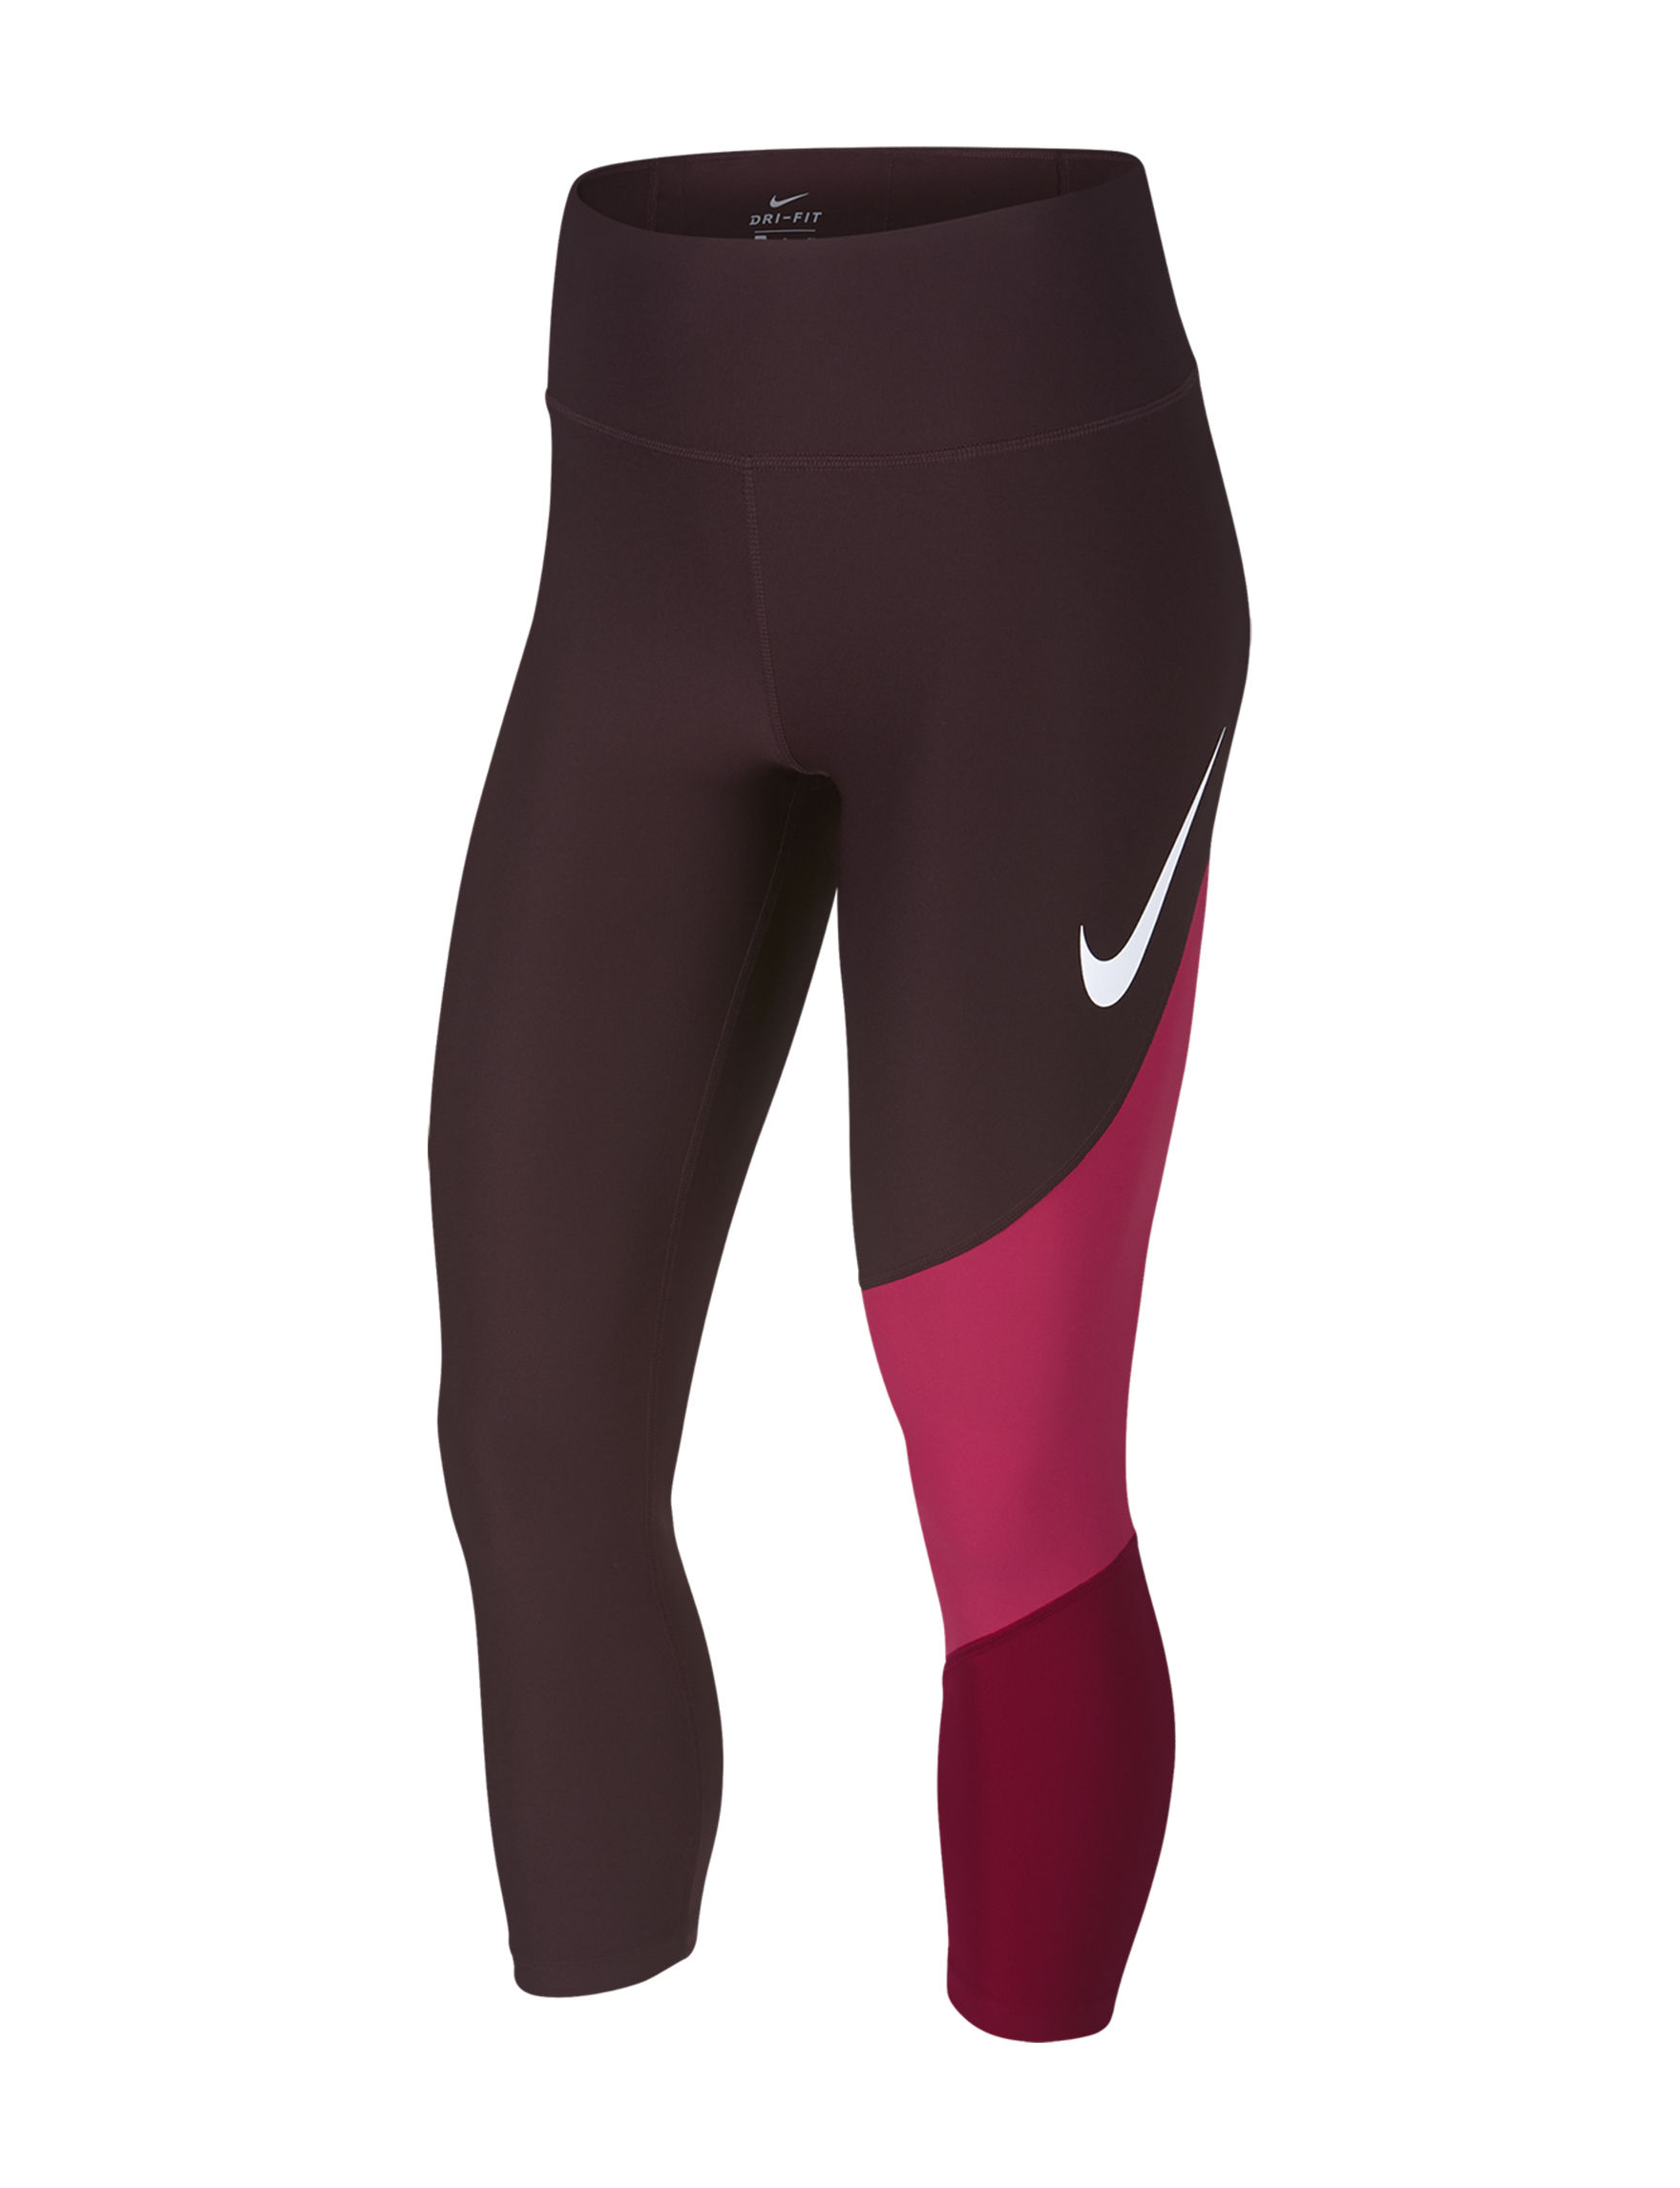 Nike Pink Leggings